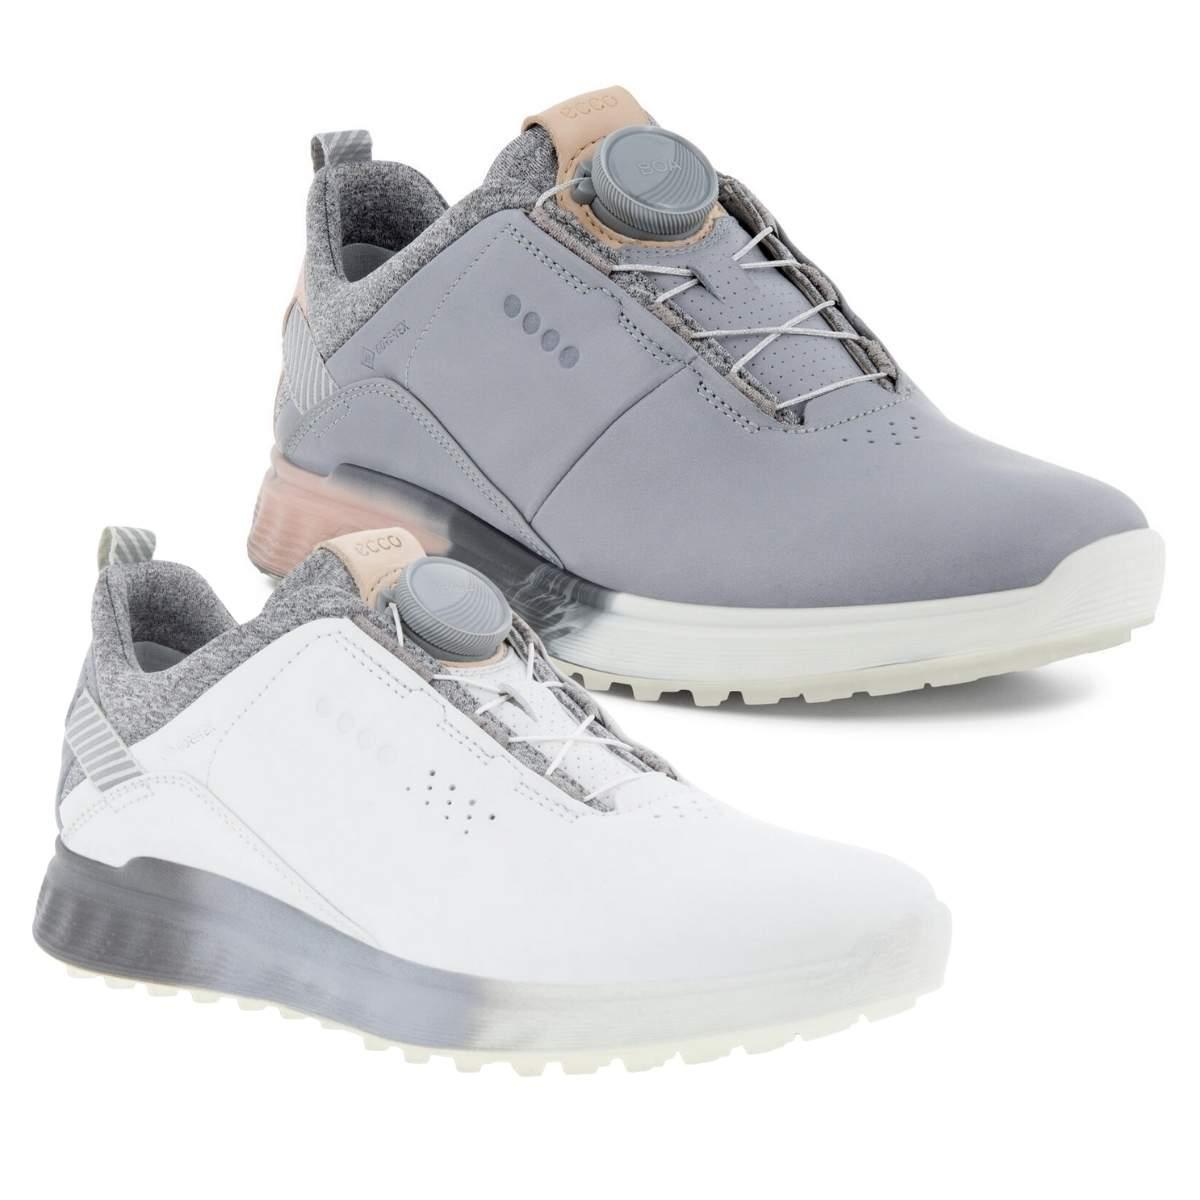 ECCO Women's S-Three BOA Golf Shoe